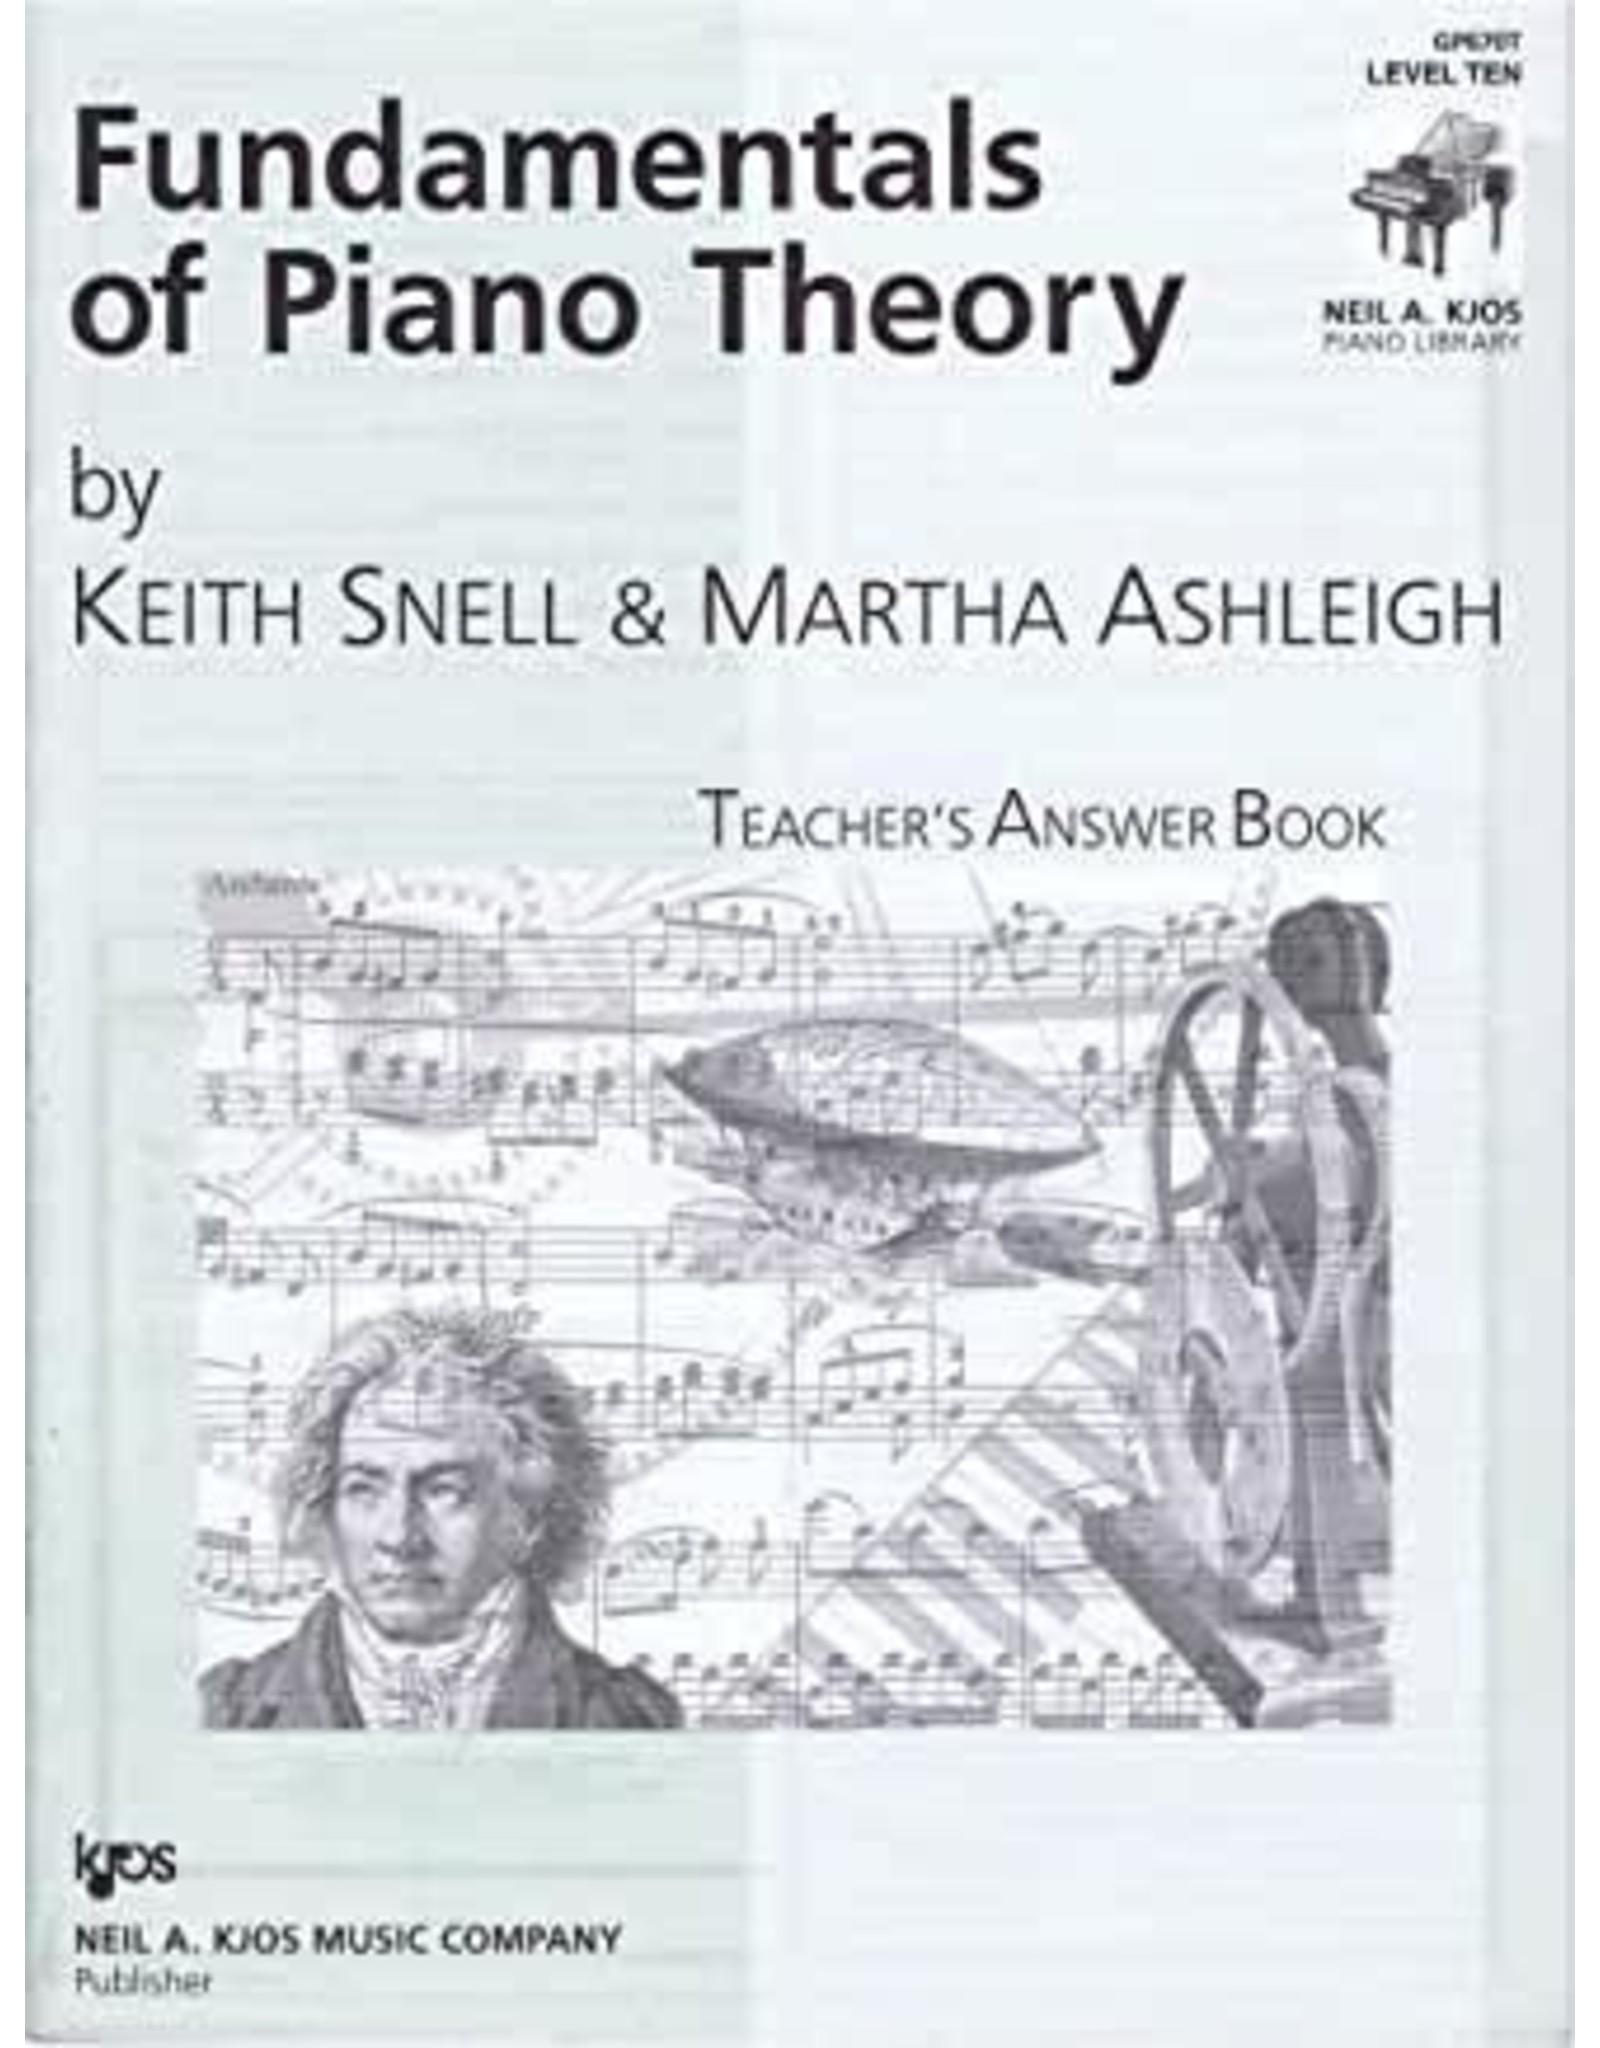 Kjos Fundamentals of Piano Theory, Level 10 Answer Book